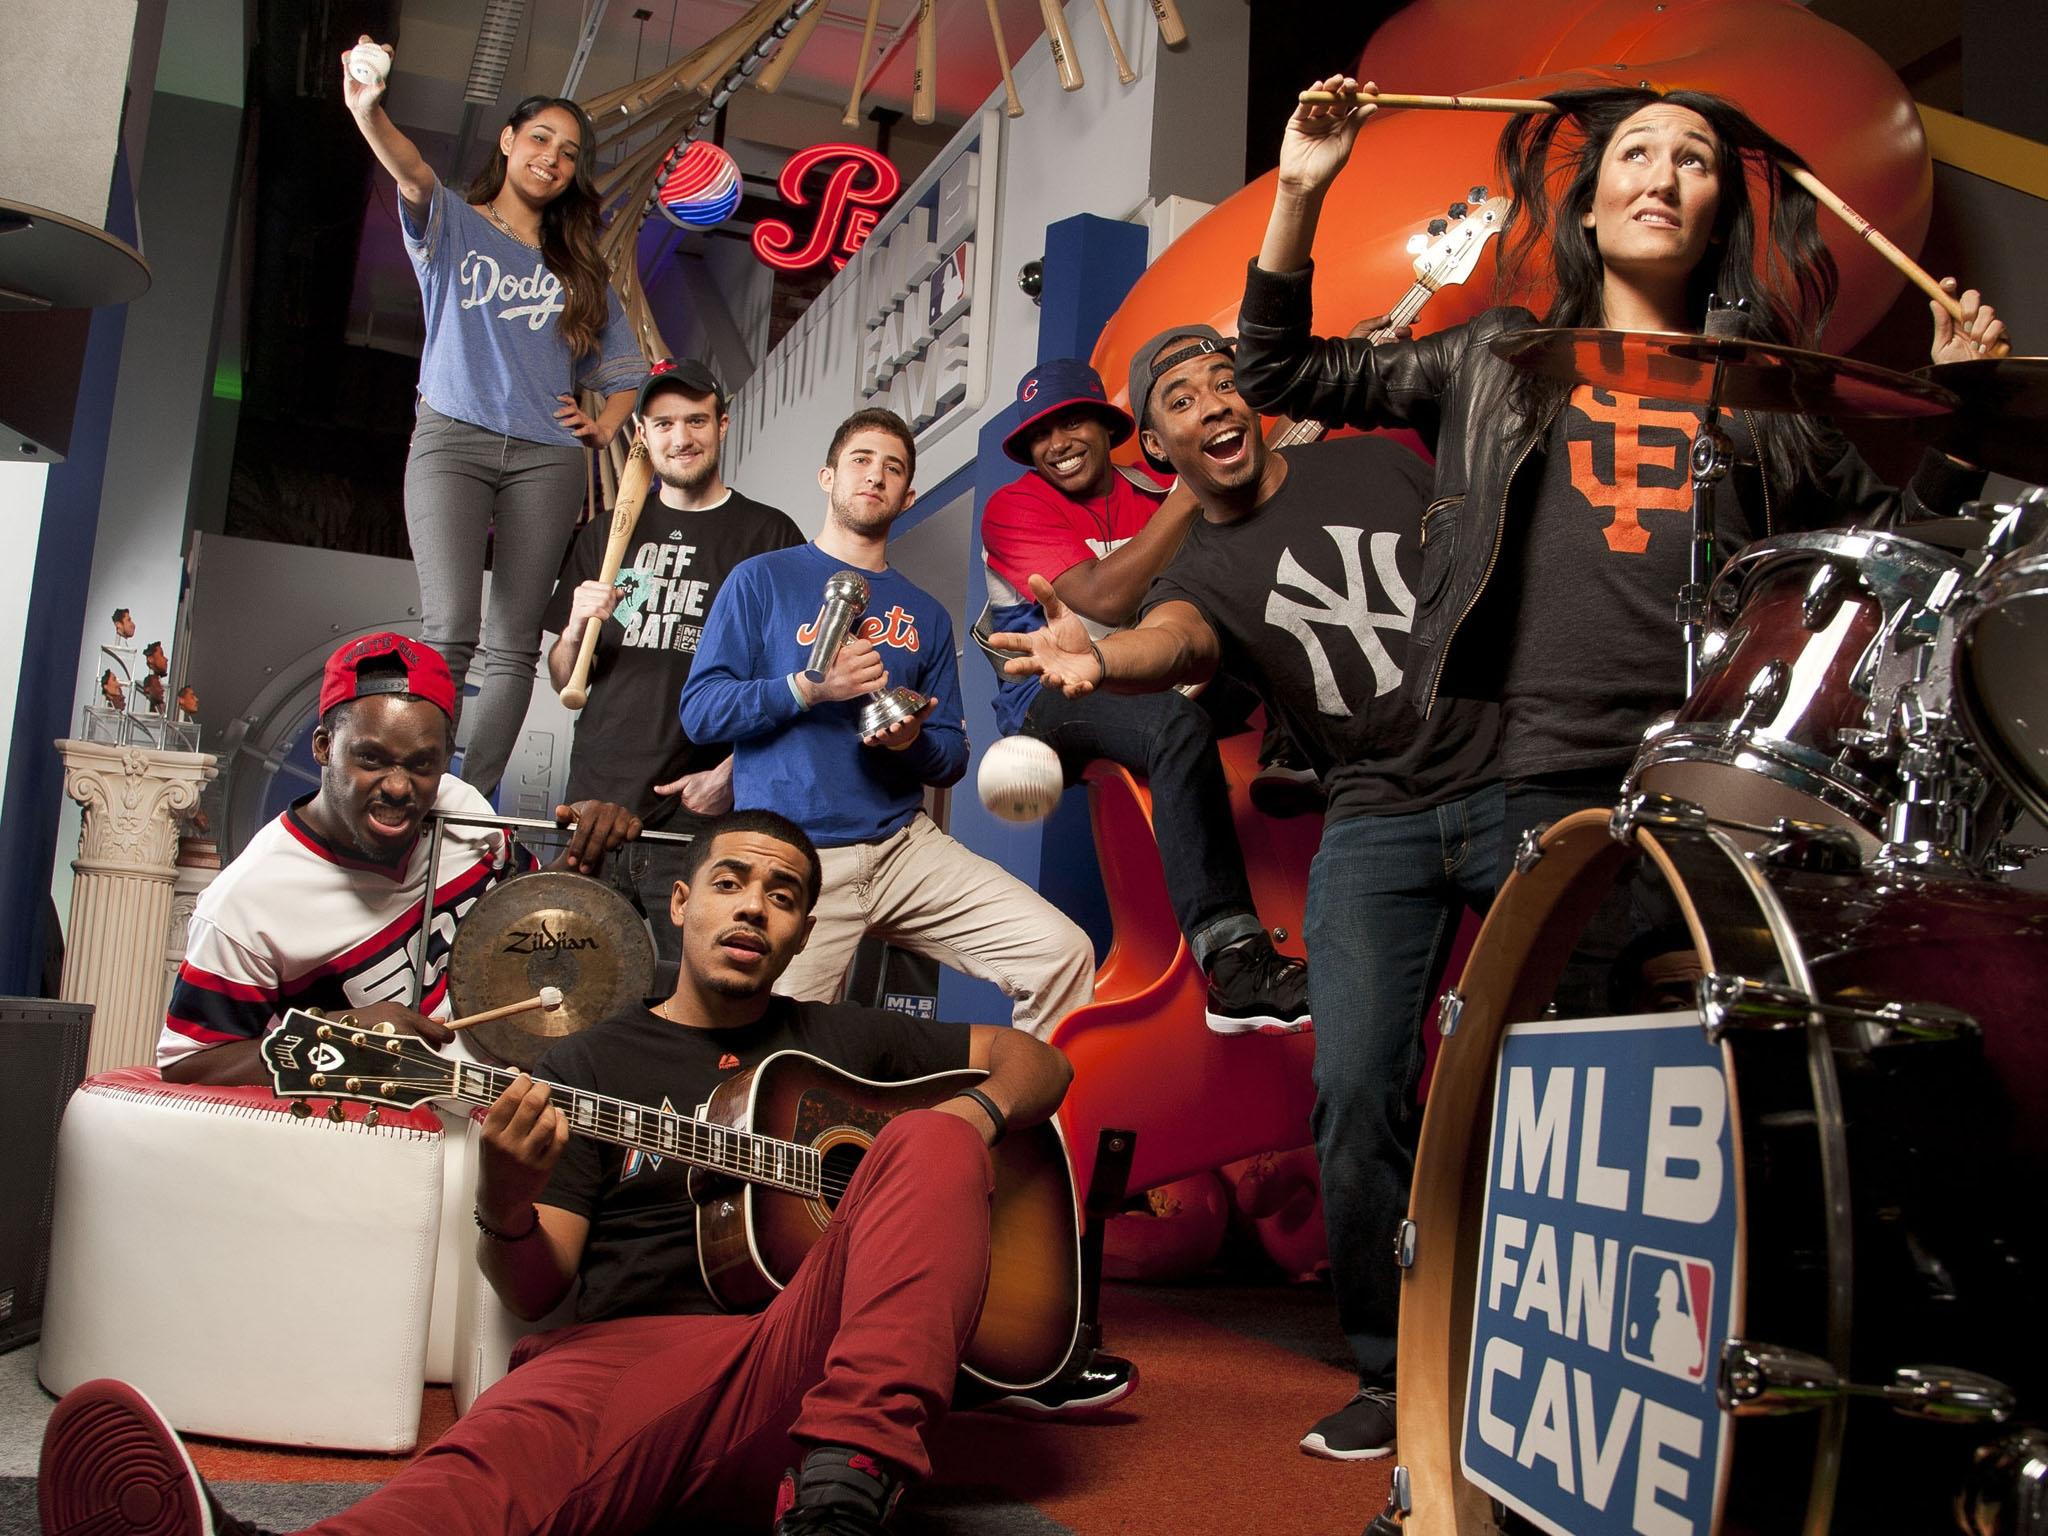 MLB-Fan-Cave2.jpg